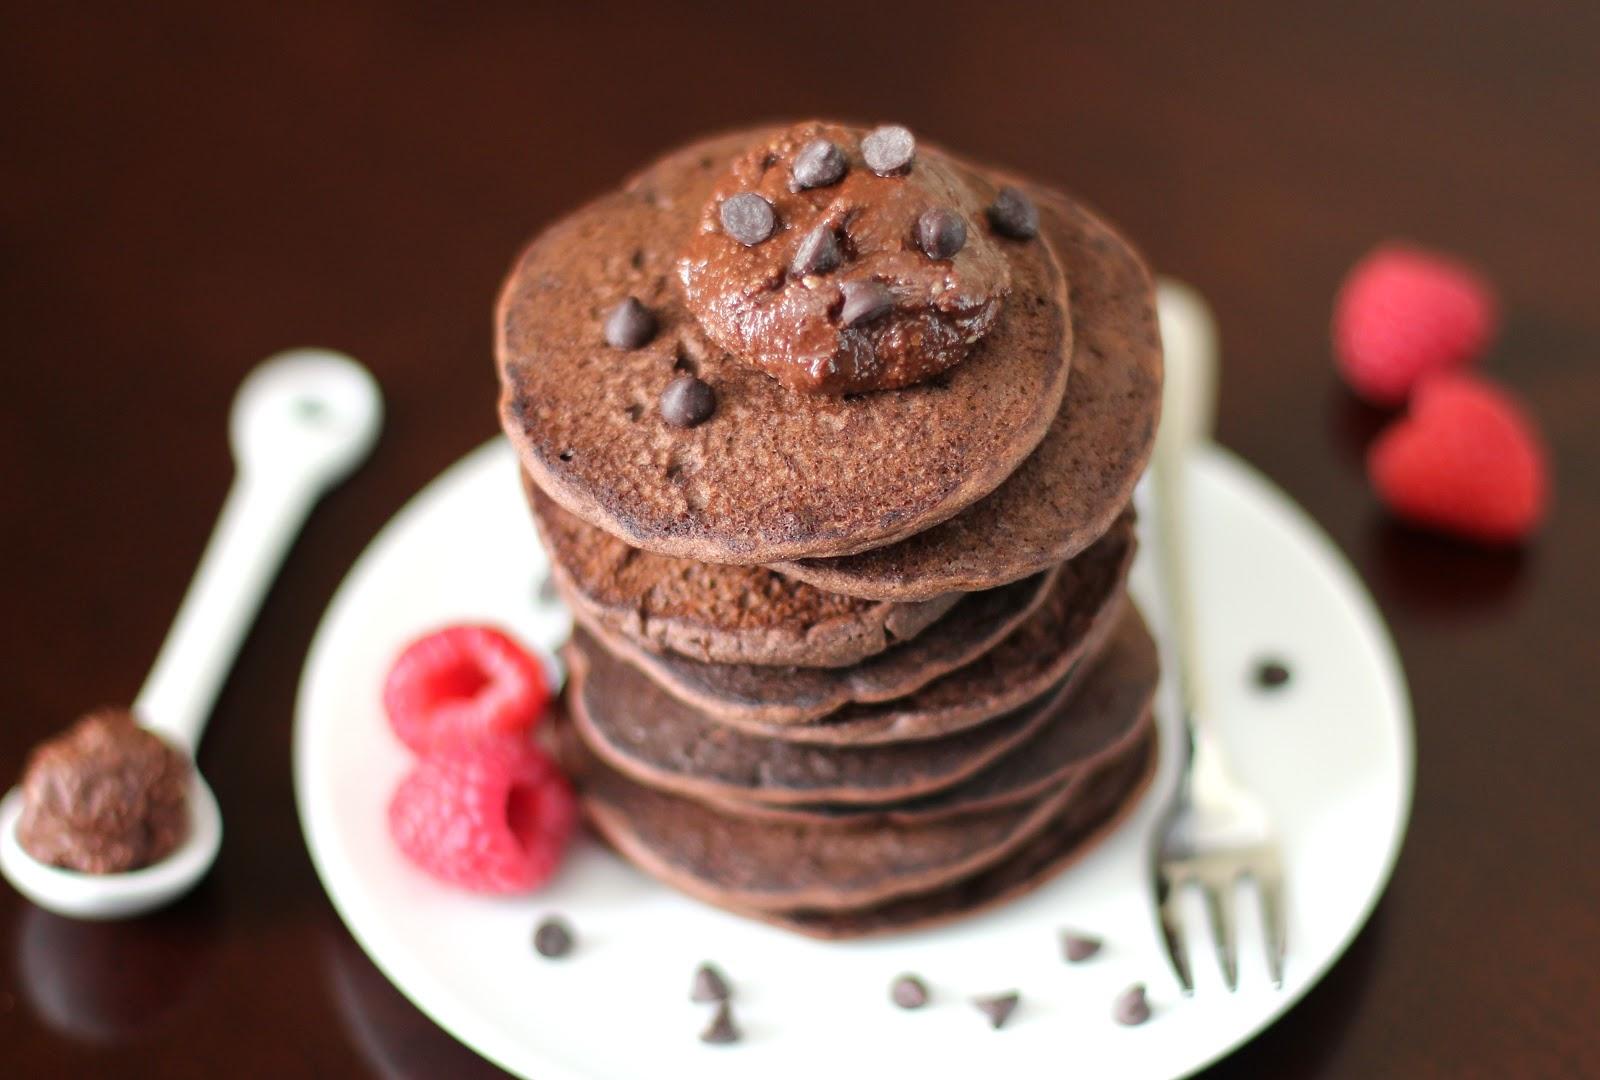 Healthy Chocolate Buckwheat Pancakes Recipe (Gluten Free) | Desserts With Benefits